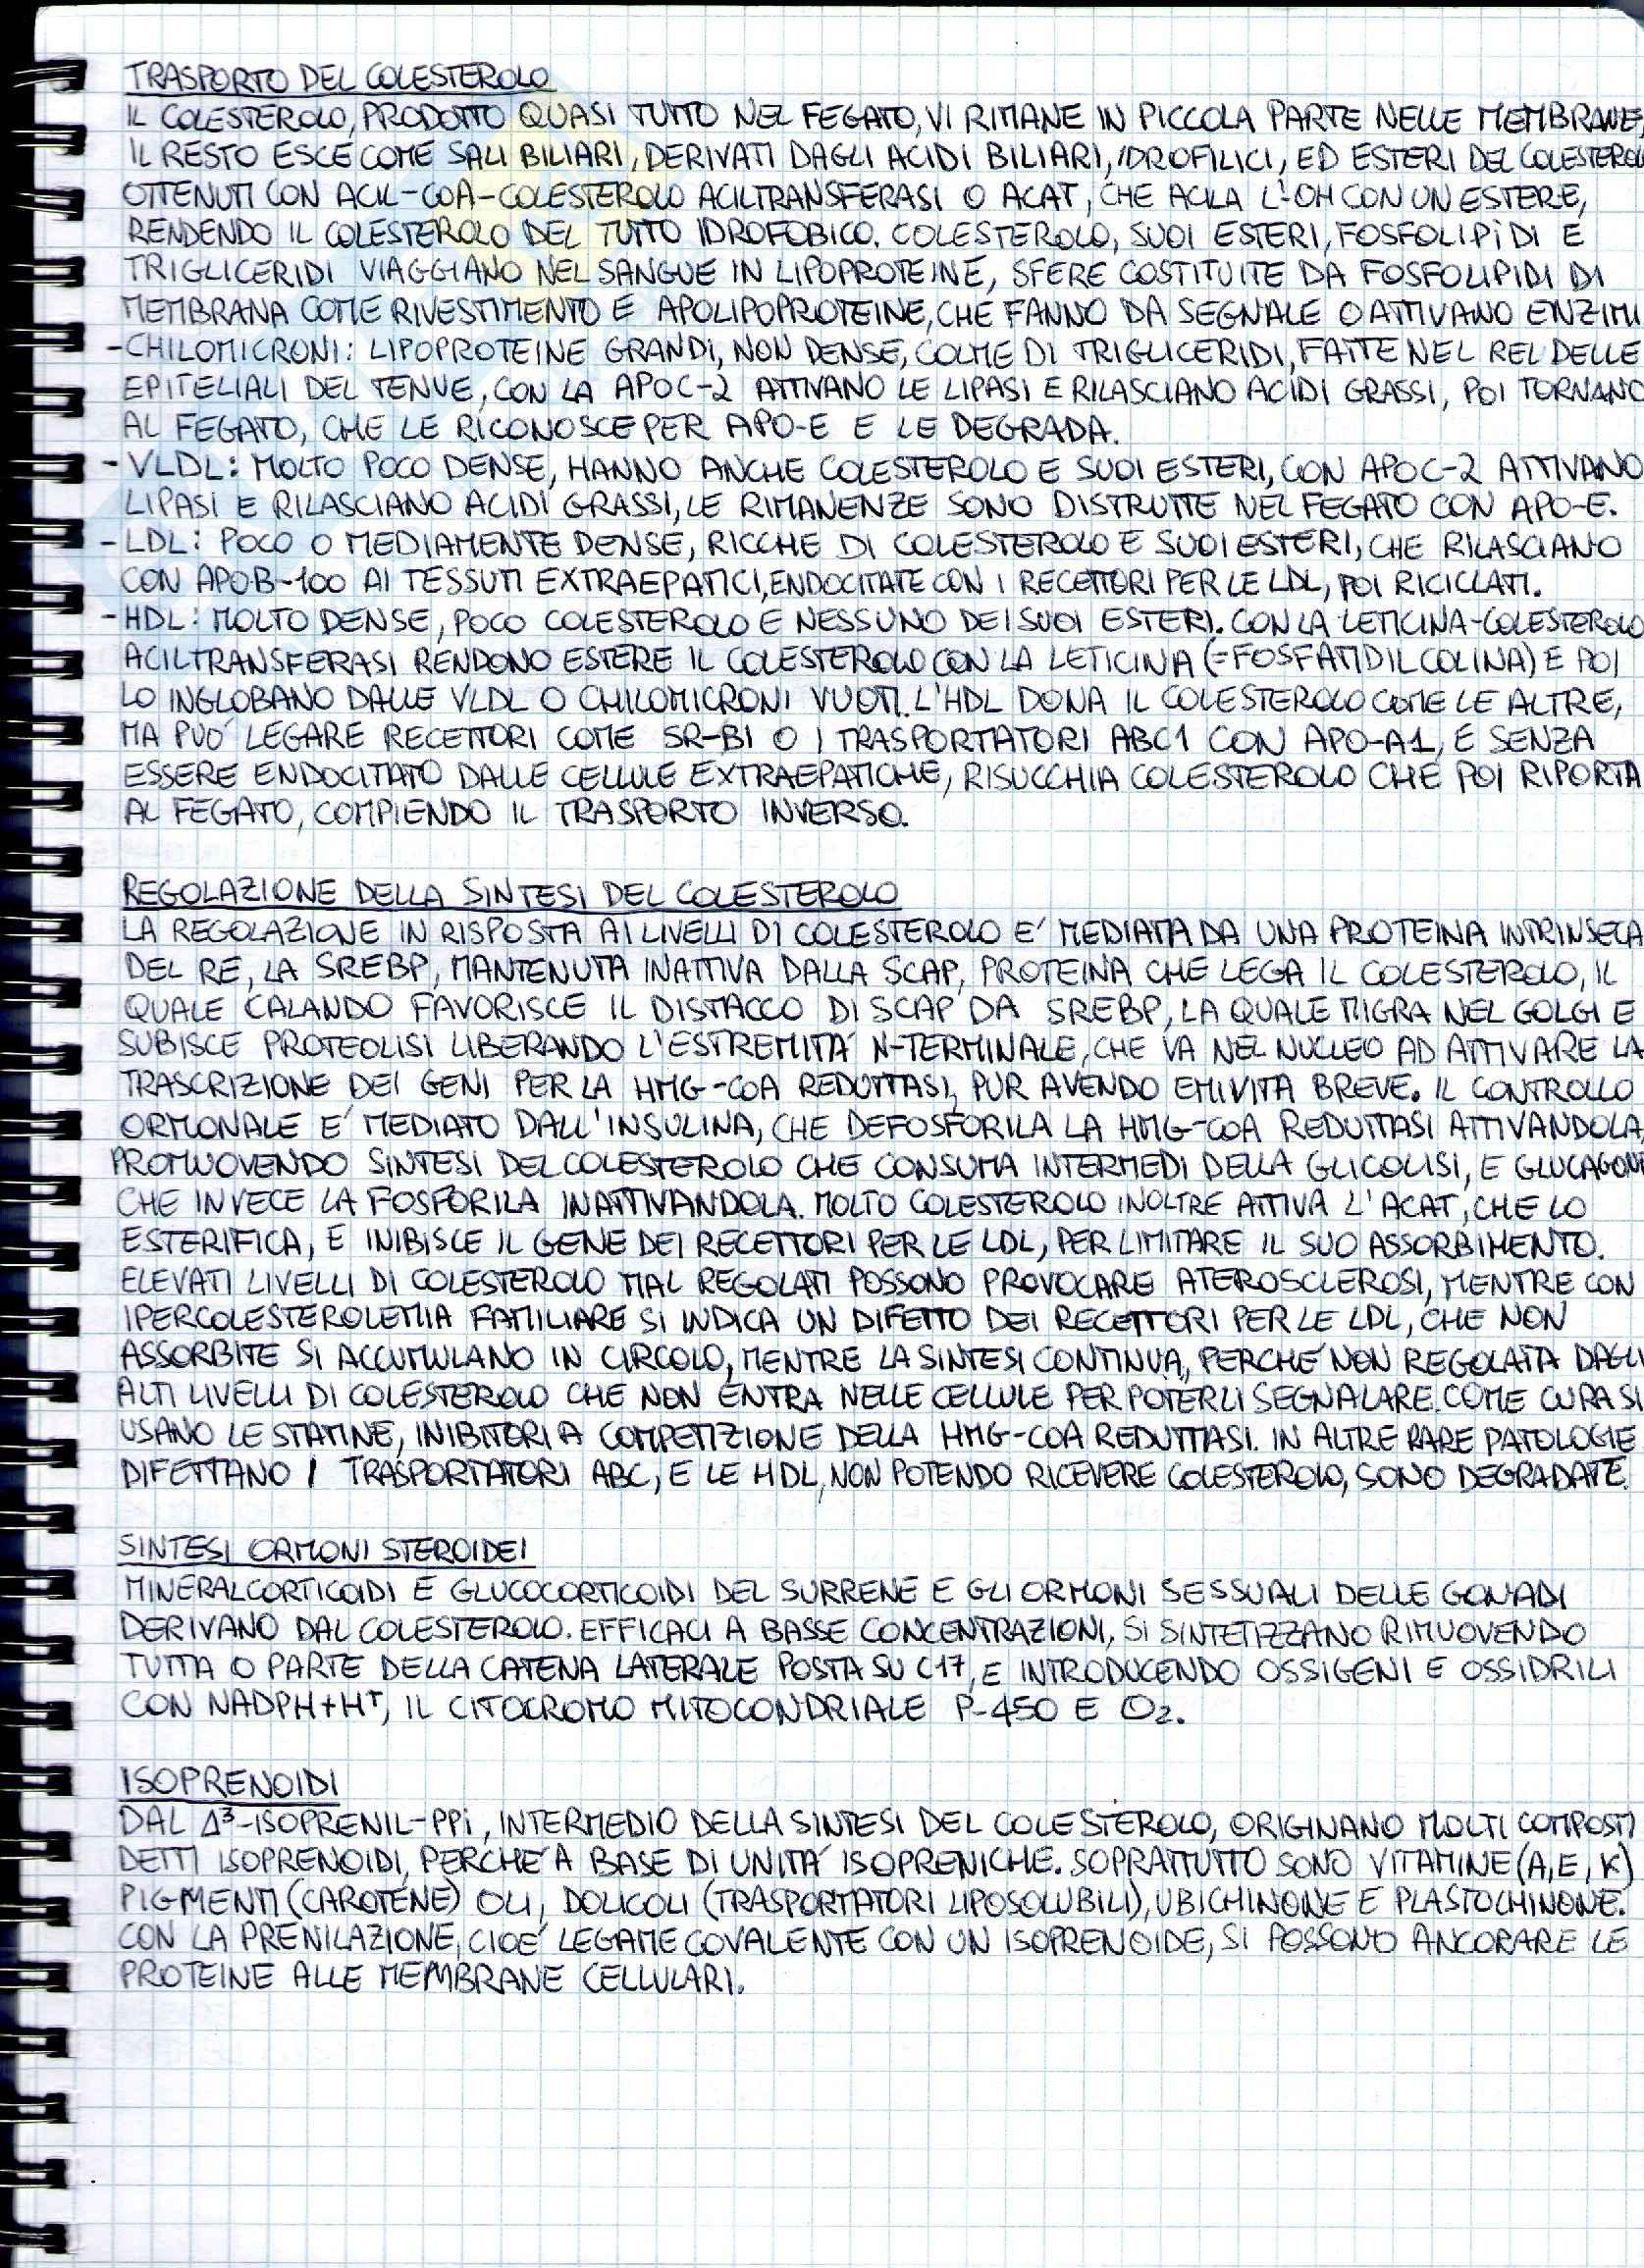 Riassunto esame Biochimica medica generale, prof. Chiarugi Pag. 16